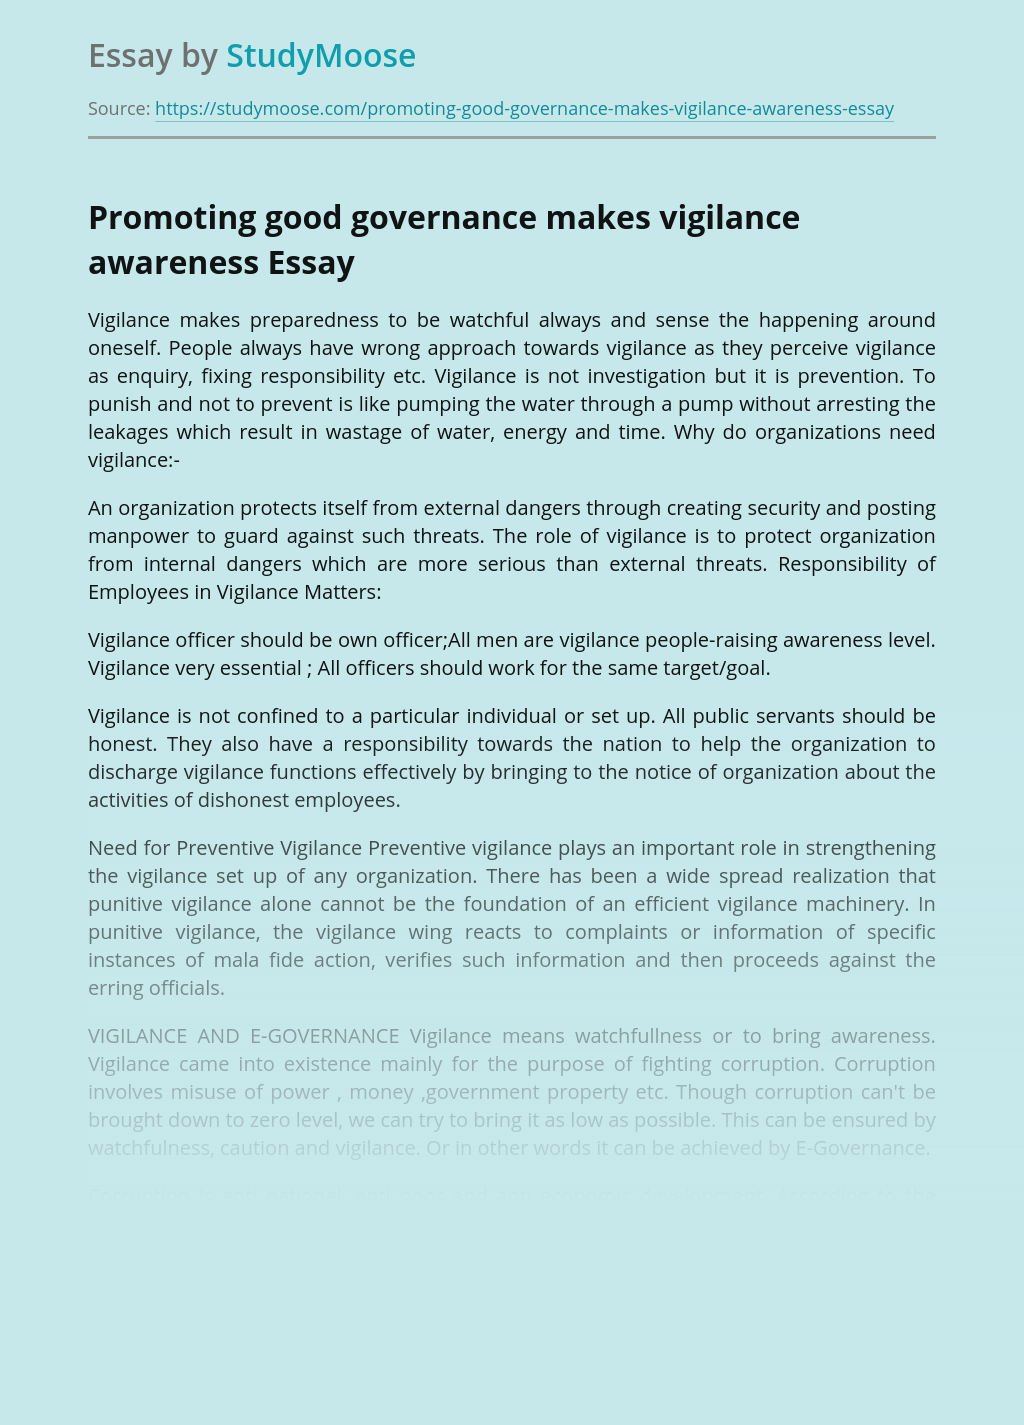 Promoting good governance makes vigilance awareness